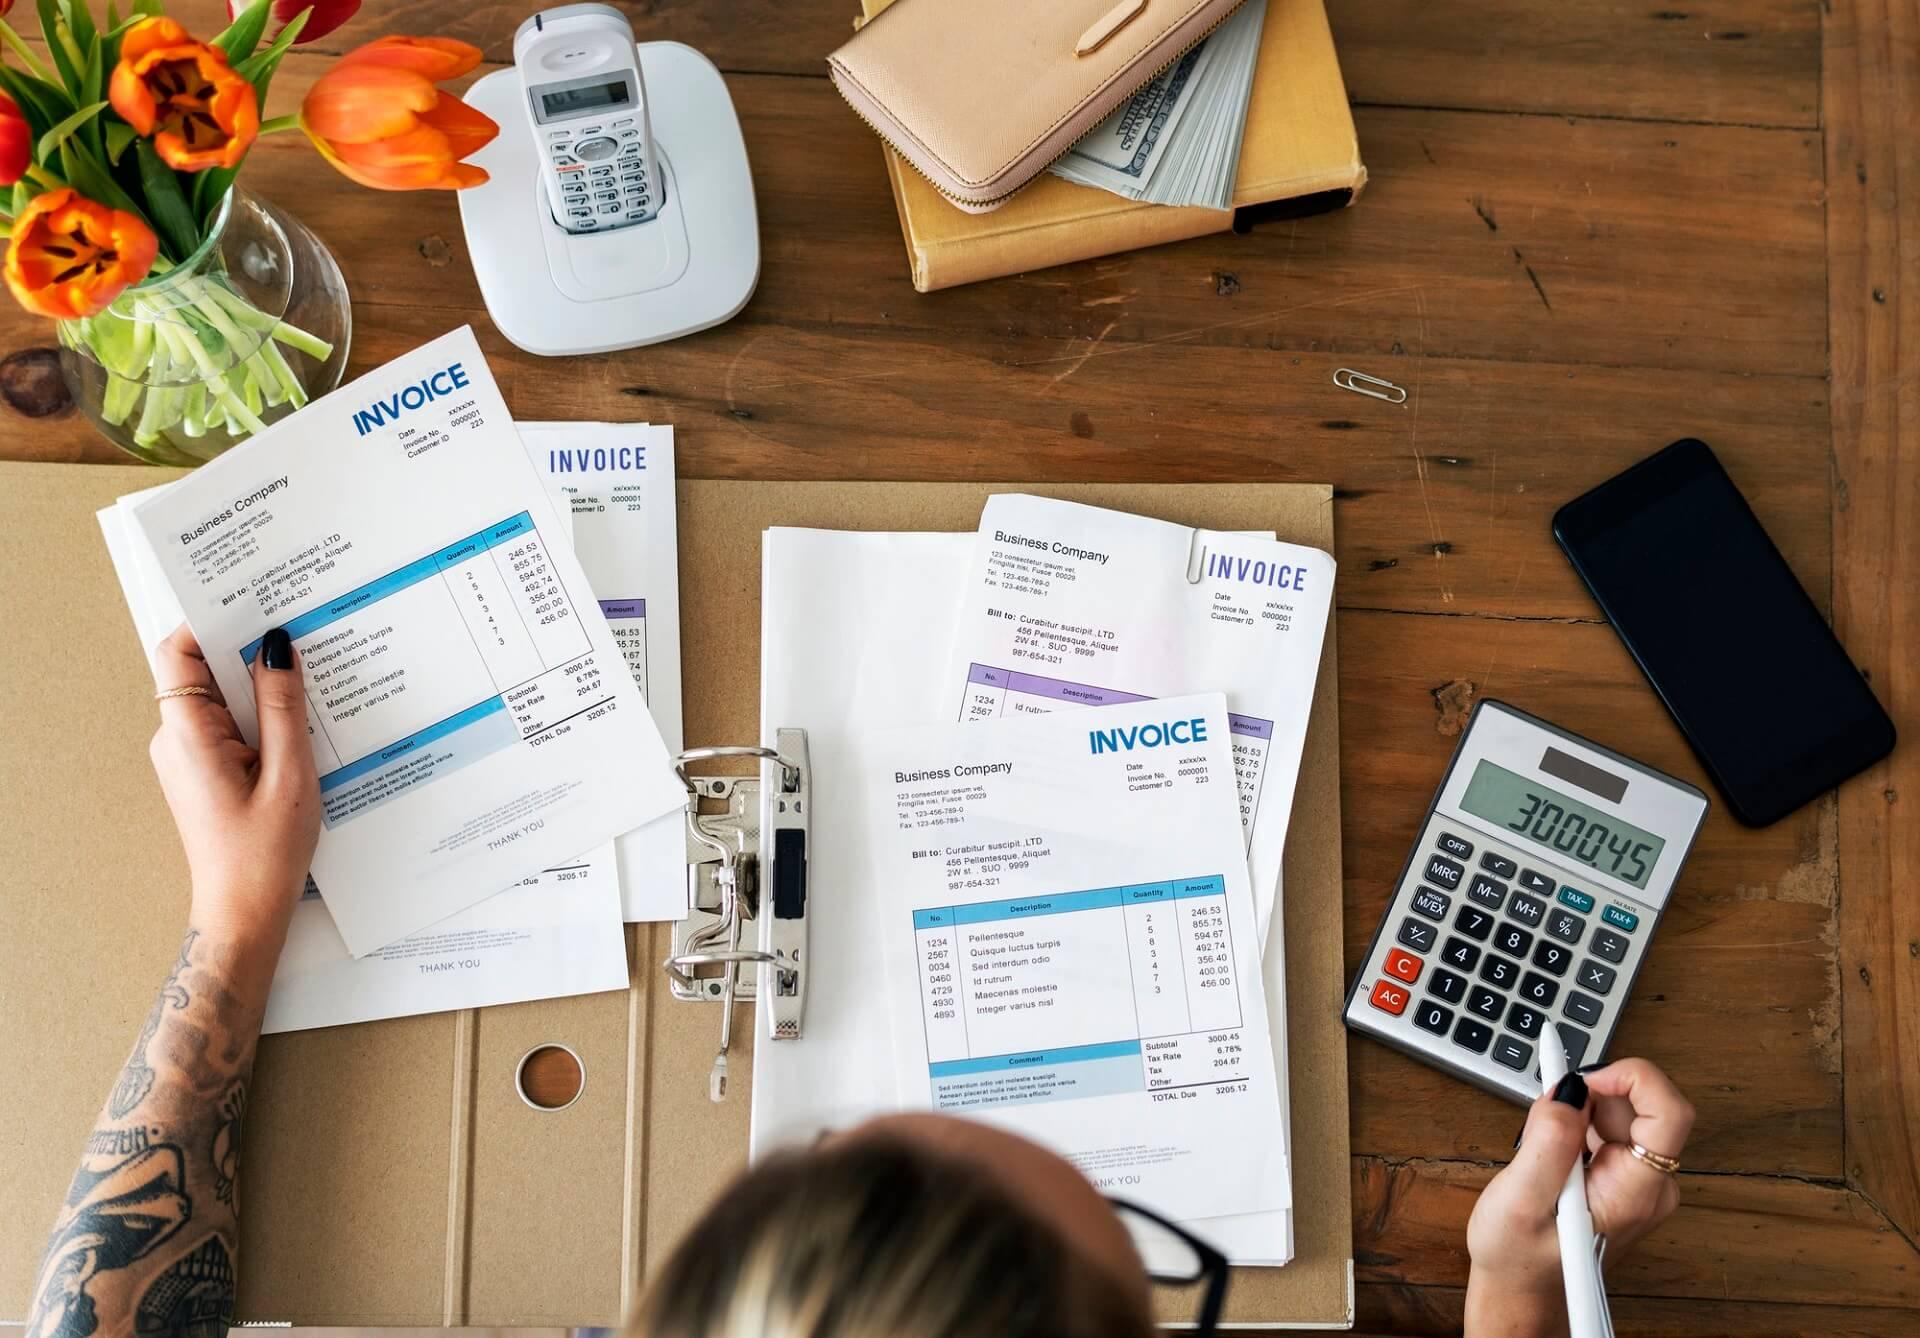 Automate Accounts Payable (AP)